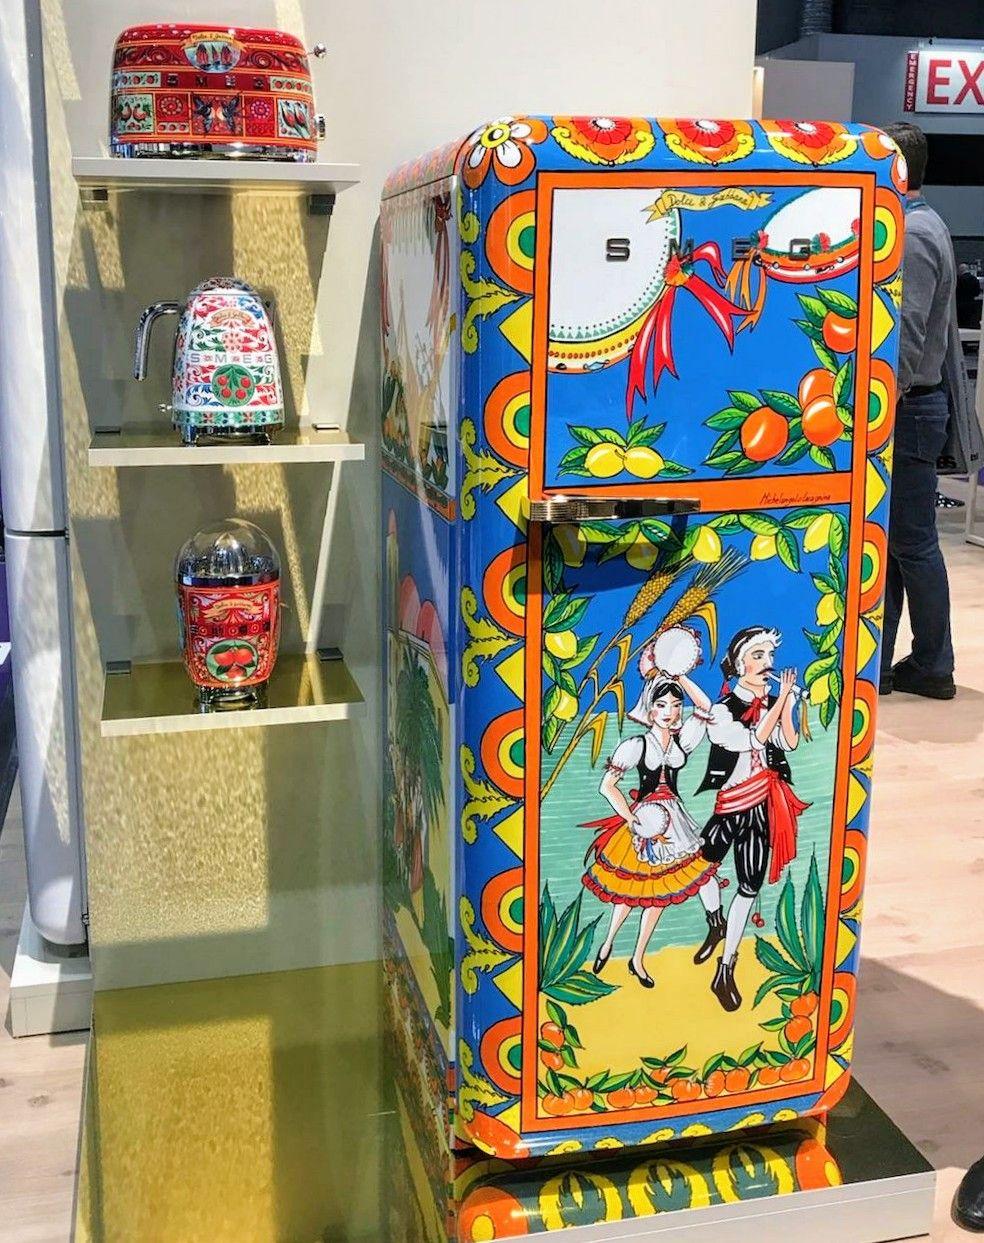 ec95159d2dd0 Smeg   Dolce+Gabbana collaboration.  kbis2018  kitchendesign  kitchen   refrigerator  fridge  toaster  blender  art  italian  classic  modern   bold  bright ...